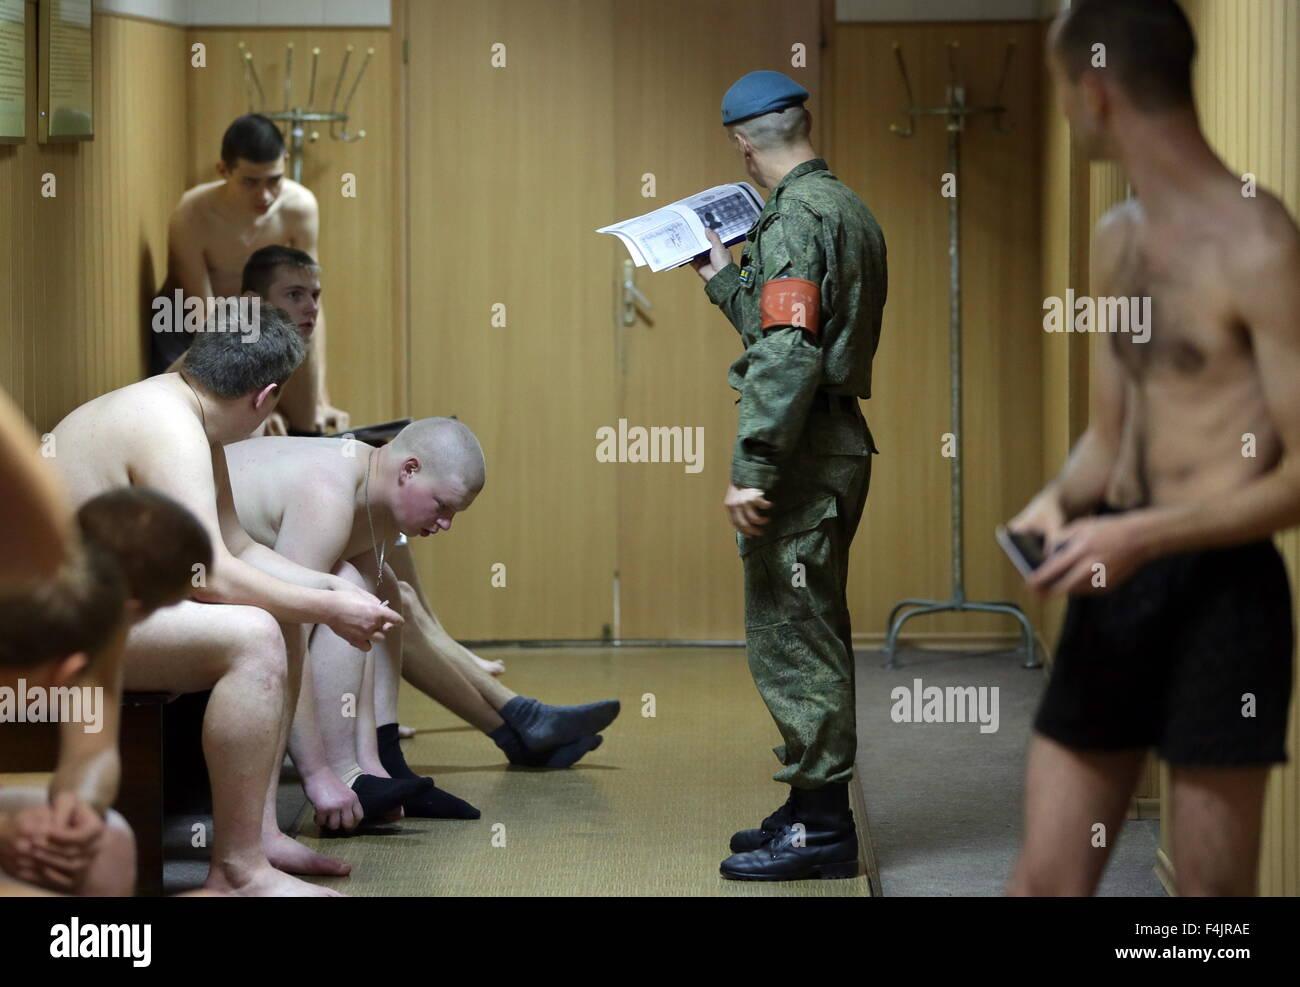 Military examinations medical gay fight club 4